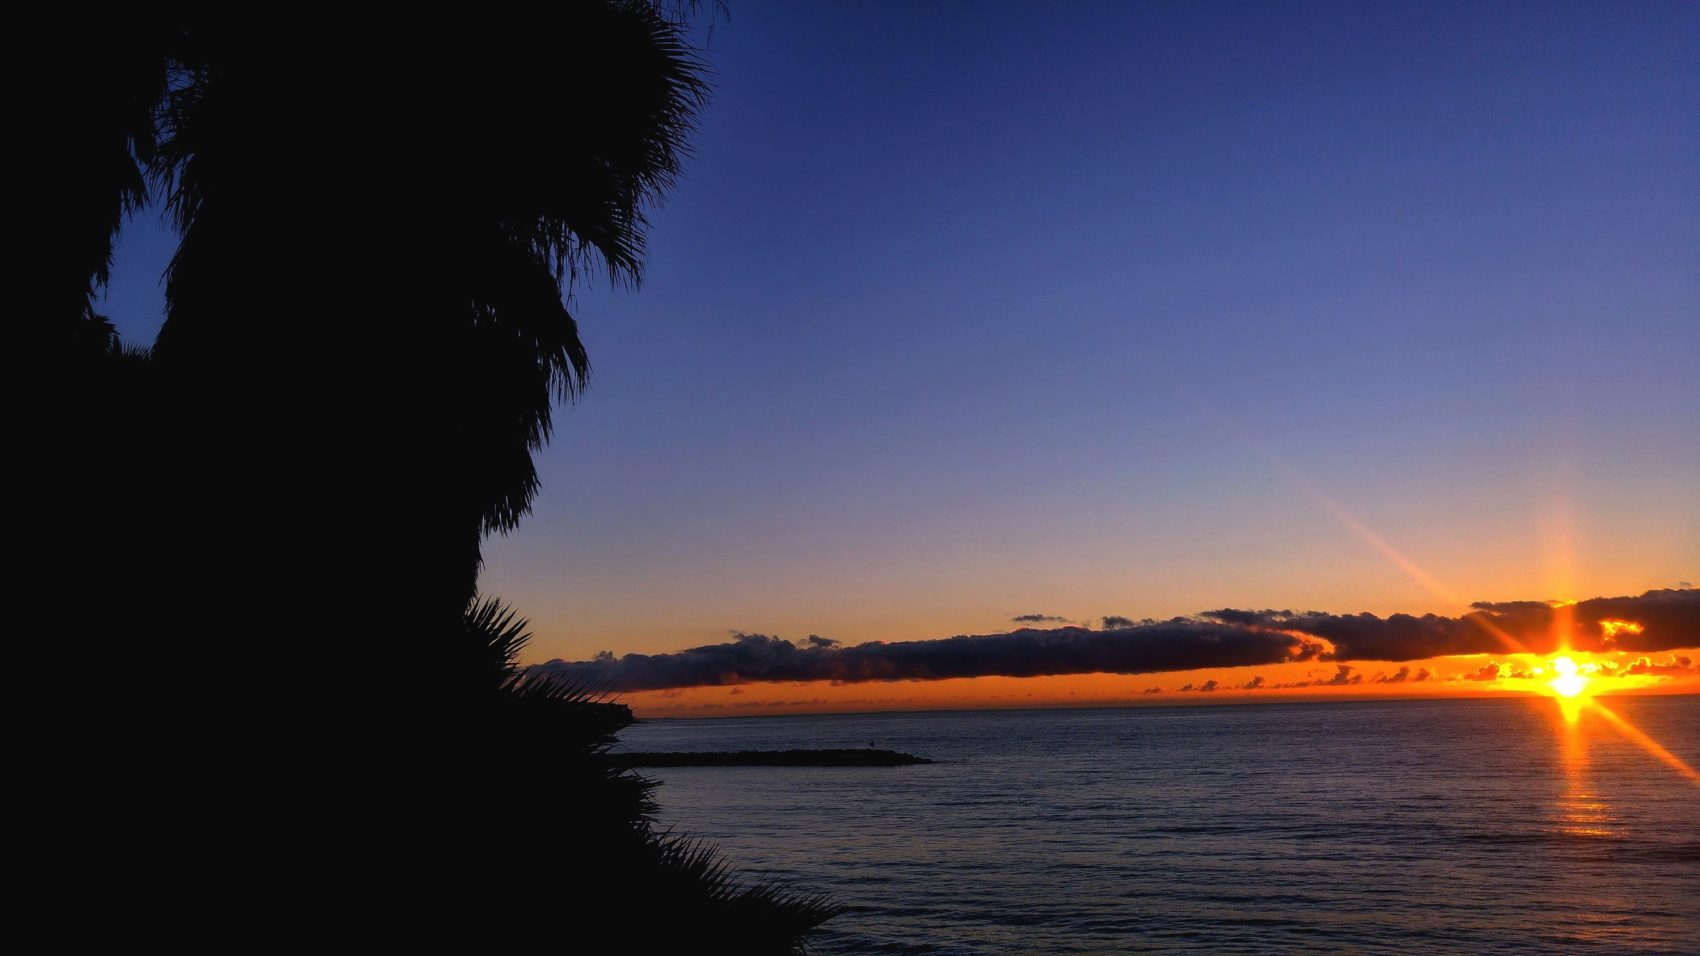 Playa del Ingles wschód słońca